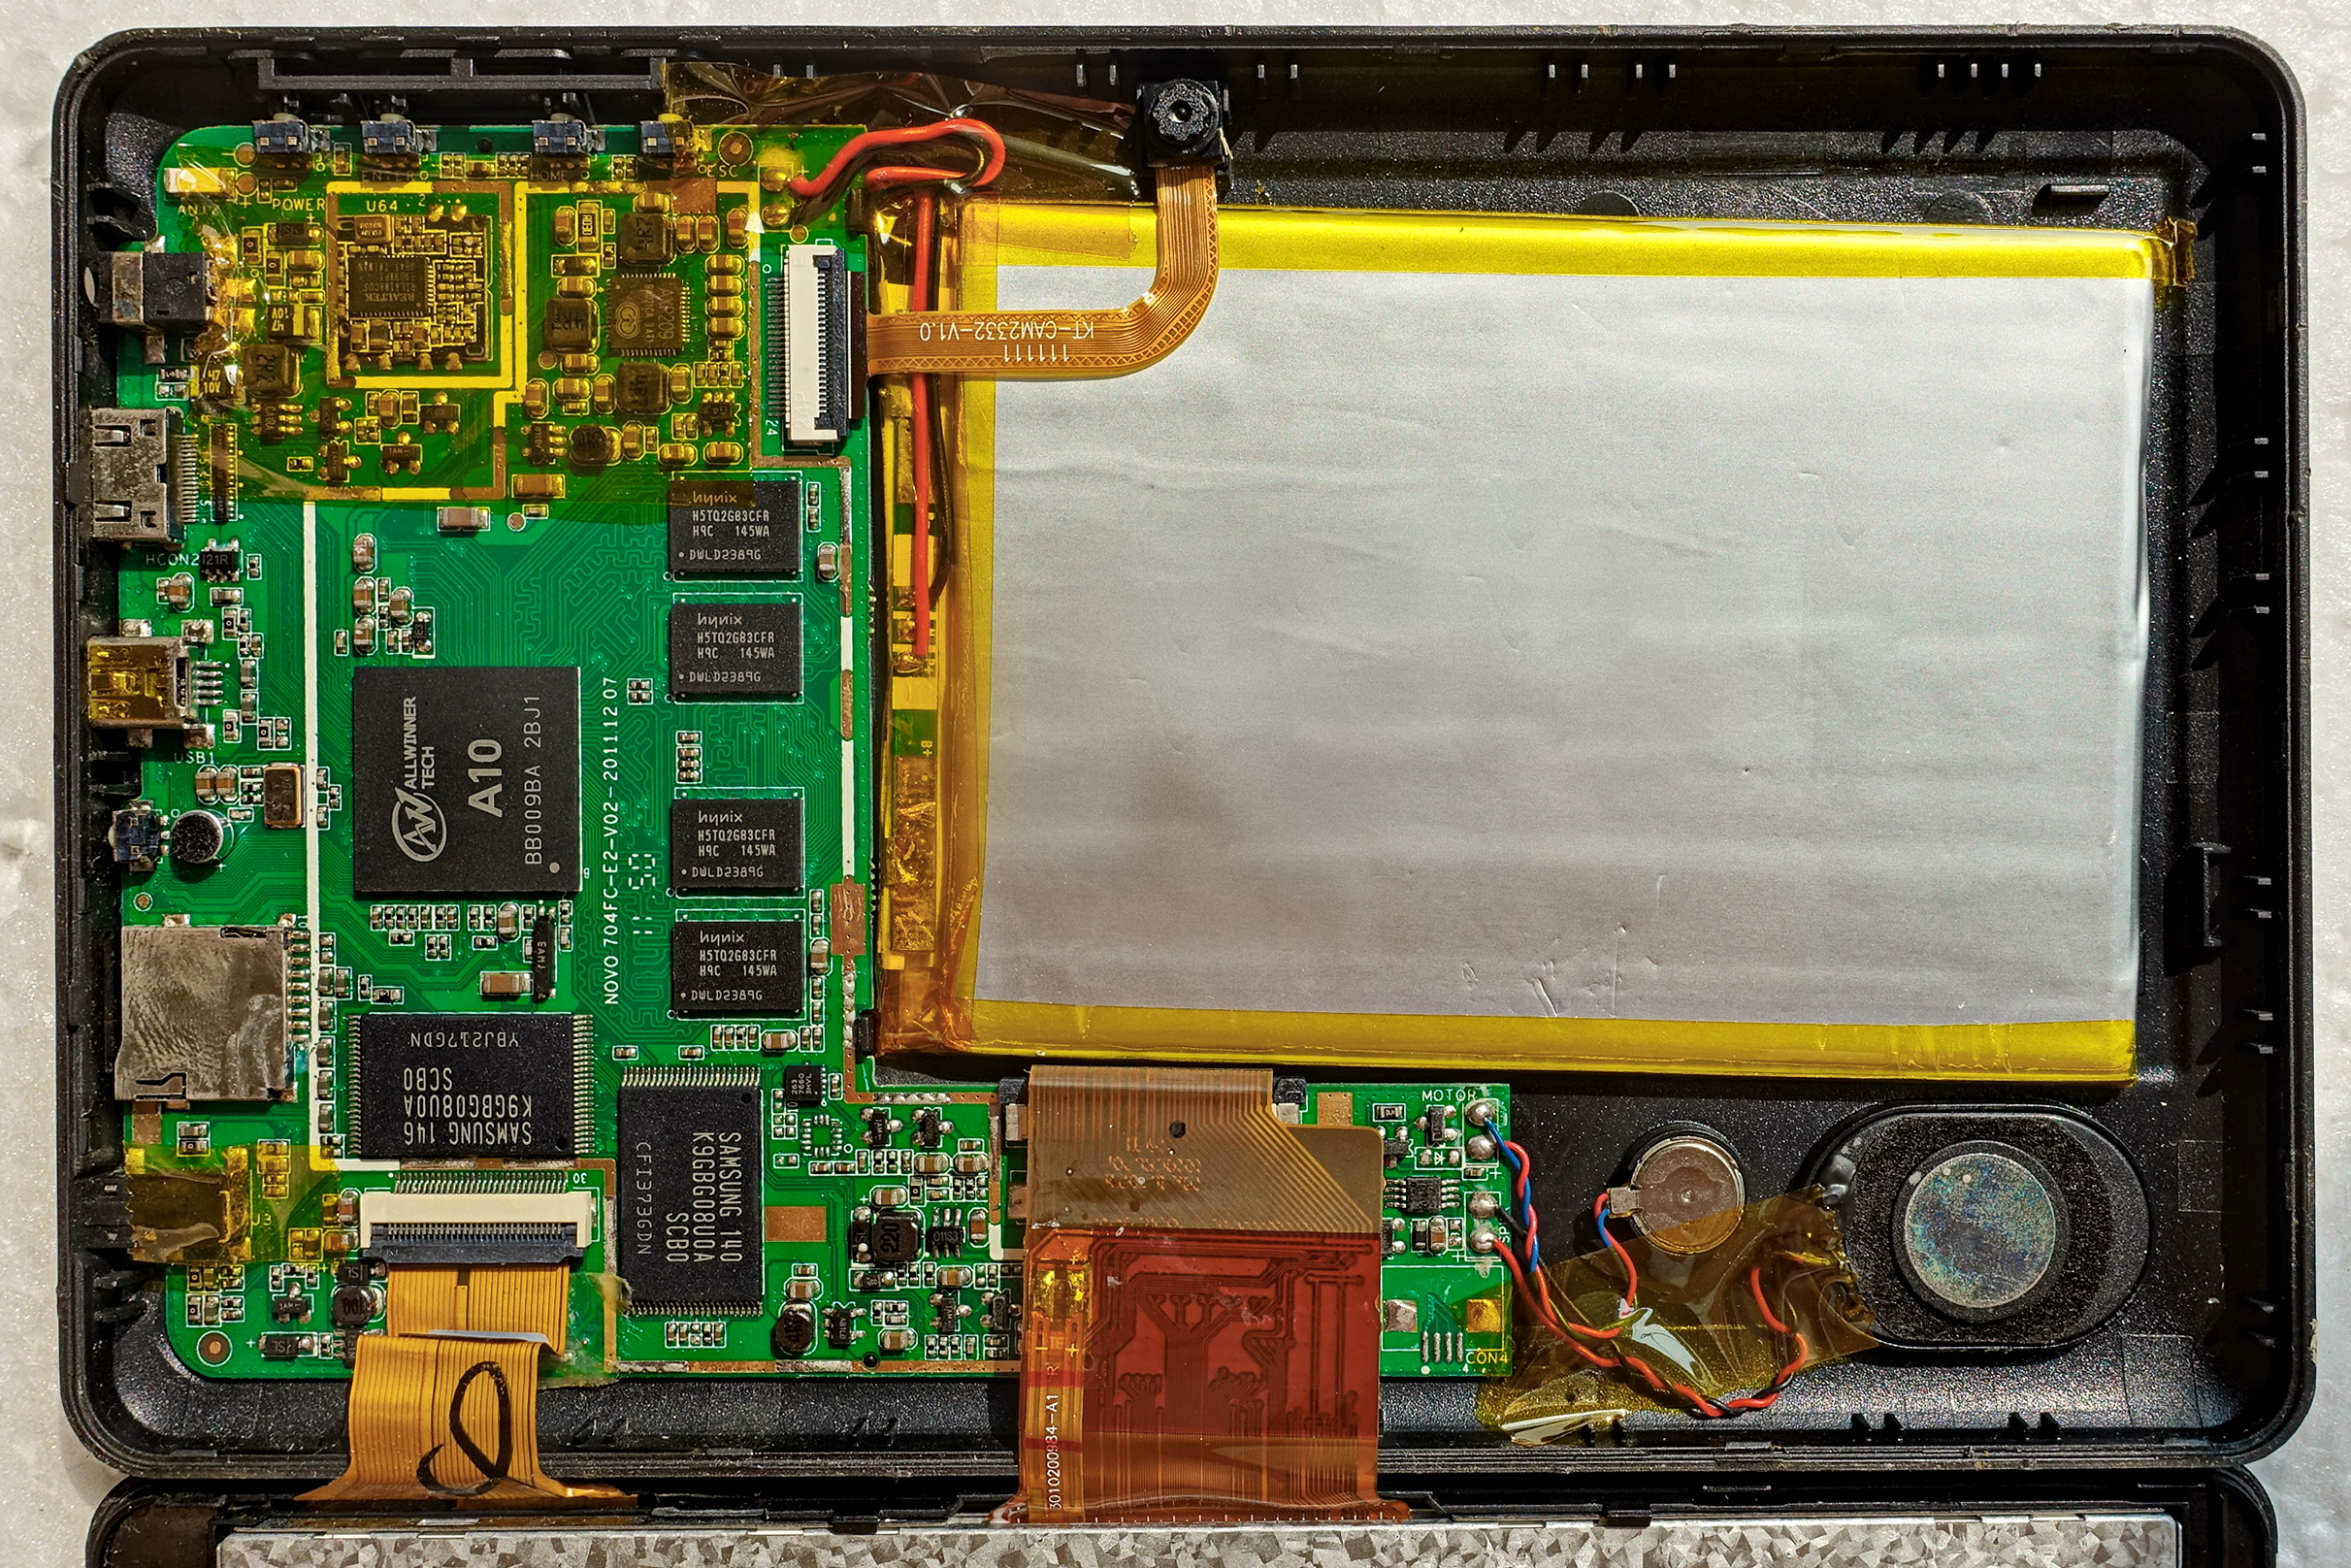 Amlogic Aml8726 Mxs Tablet Firmware Download novo7 - wikipedia